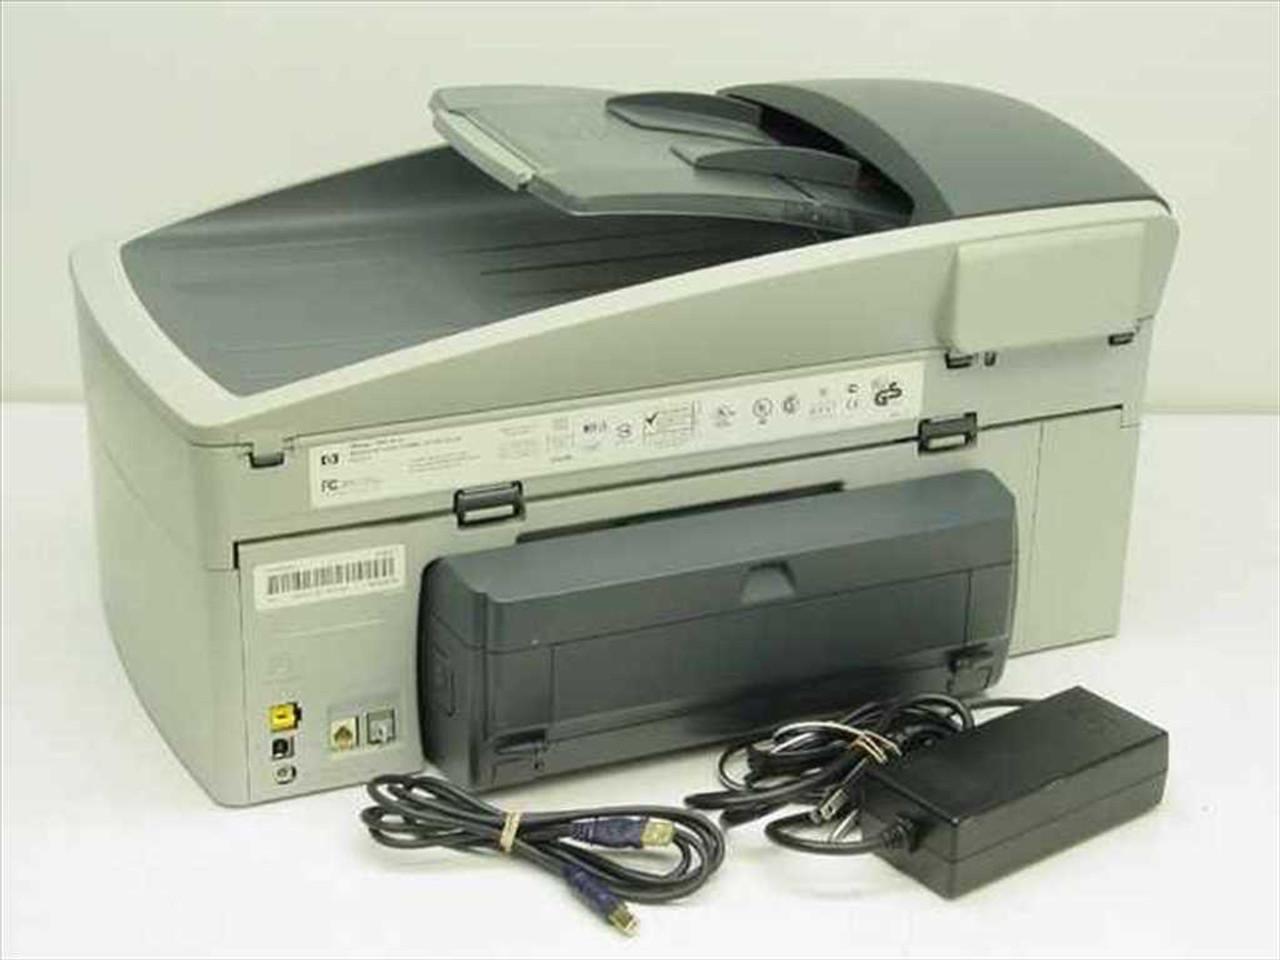 ... Hewlett Packard Q3461A HP OfficeJet 7310 All-in-One Printer Scanner  w/Fee ...